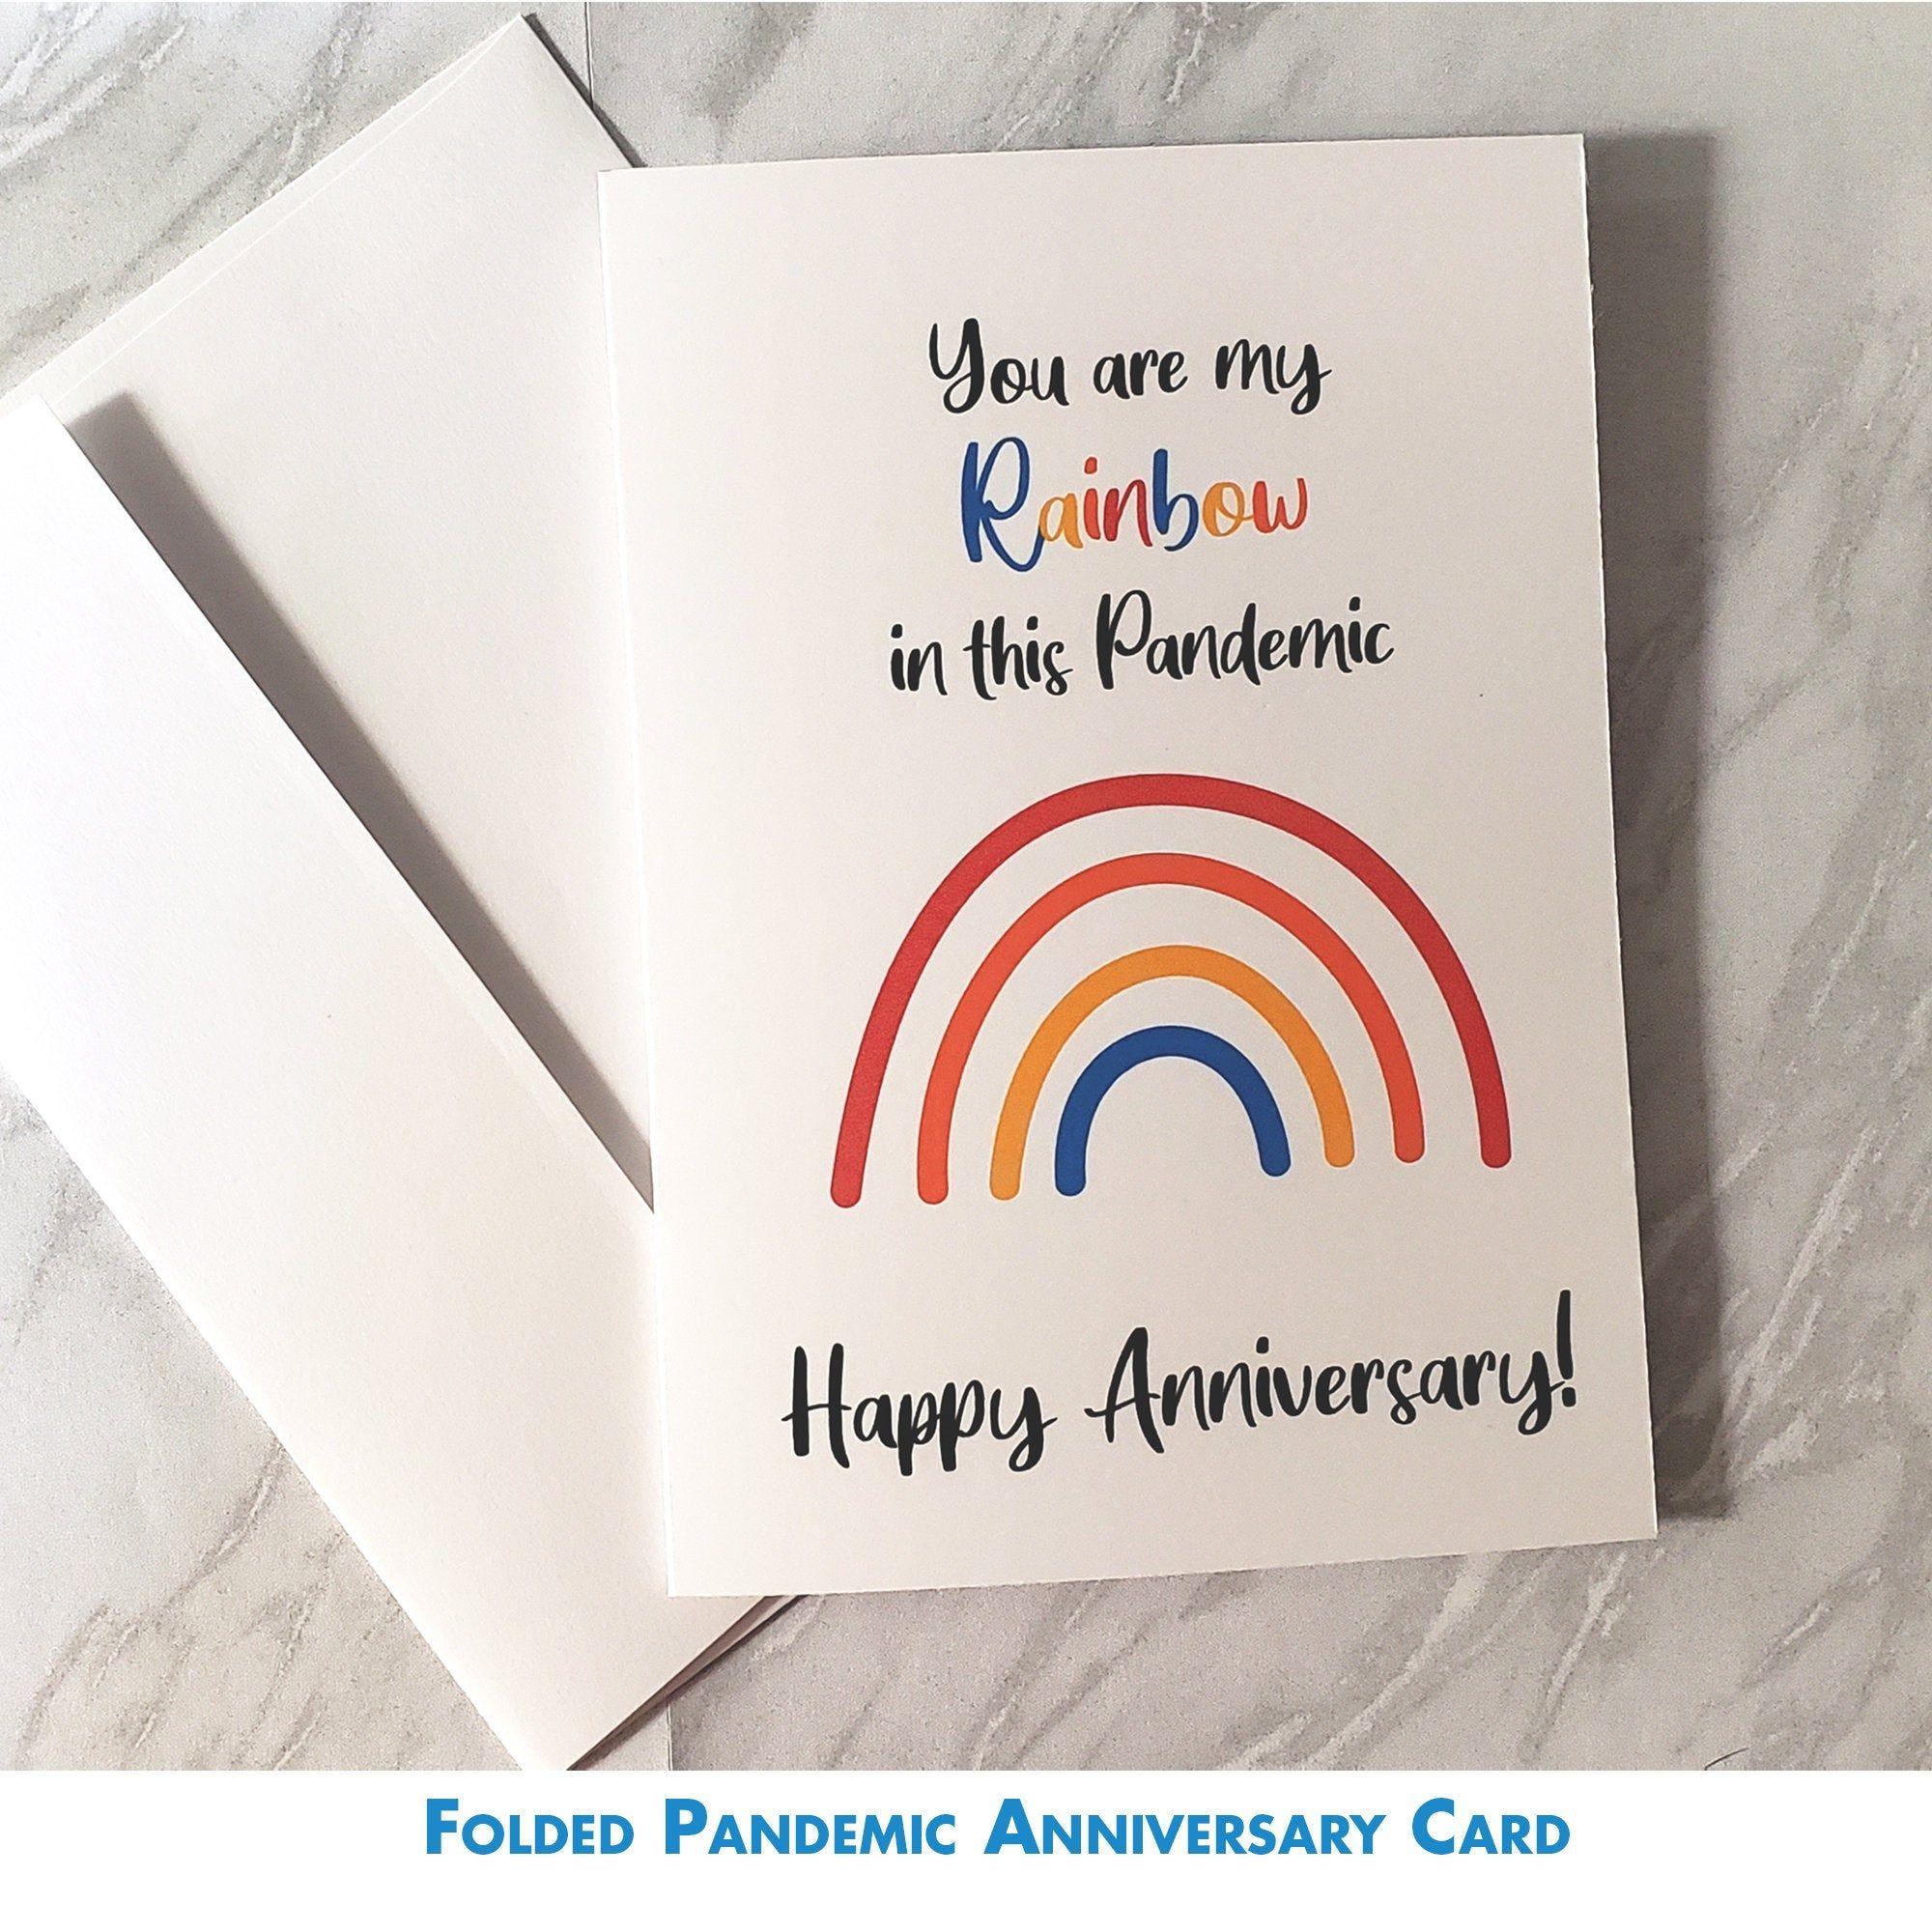 Pin on Anniversary